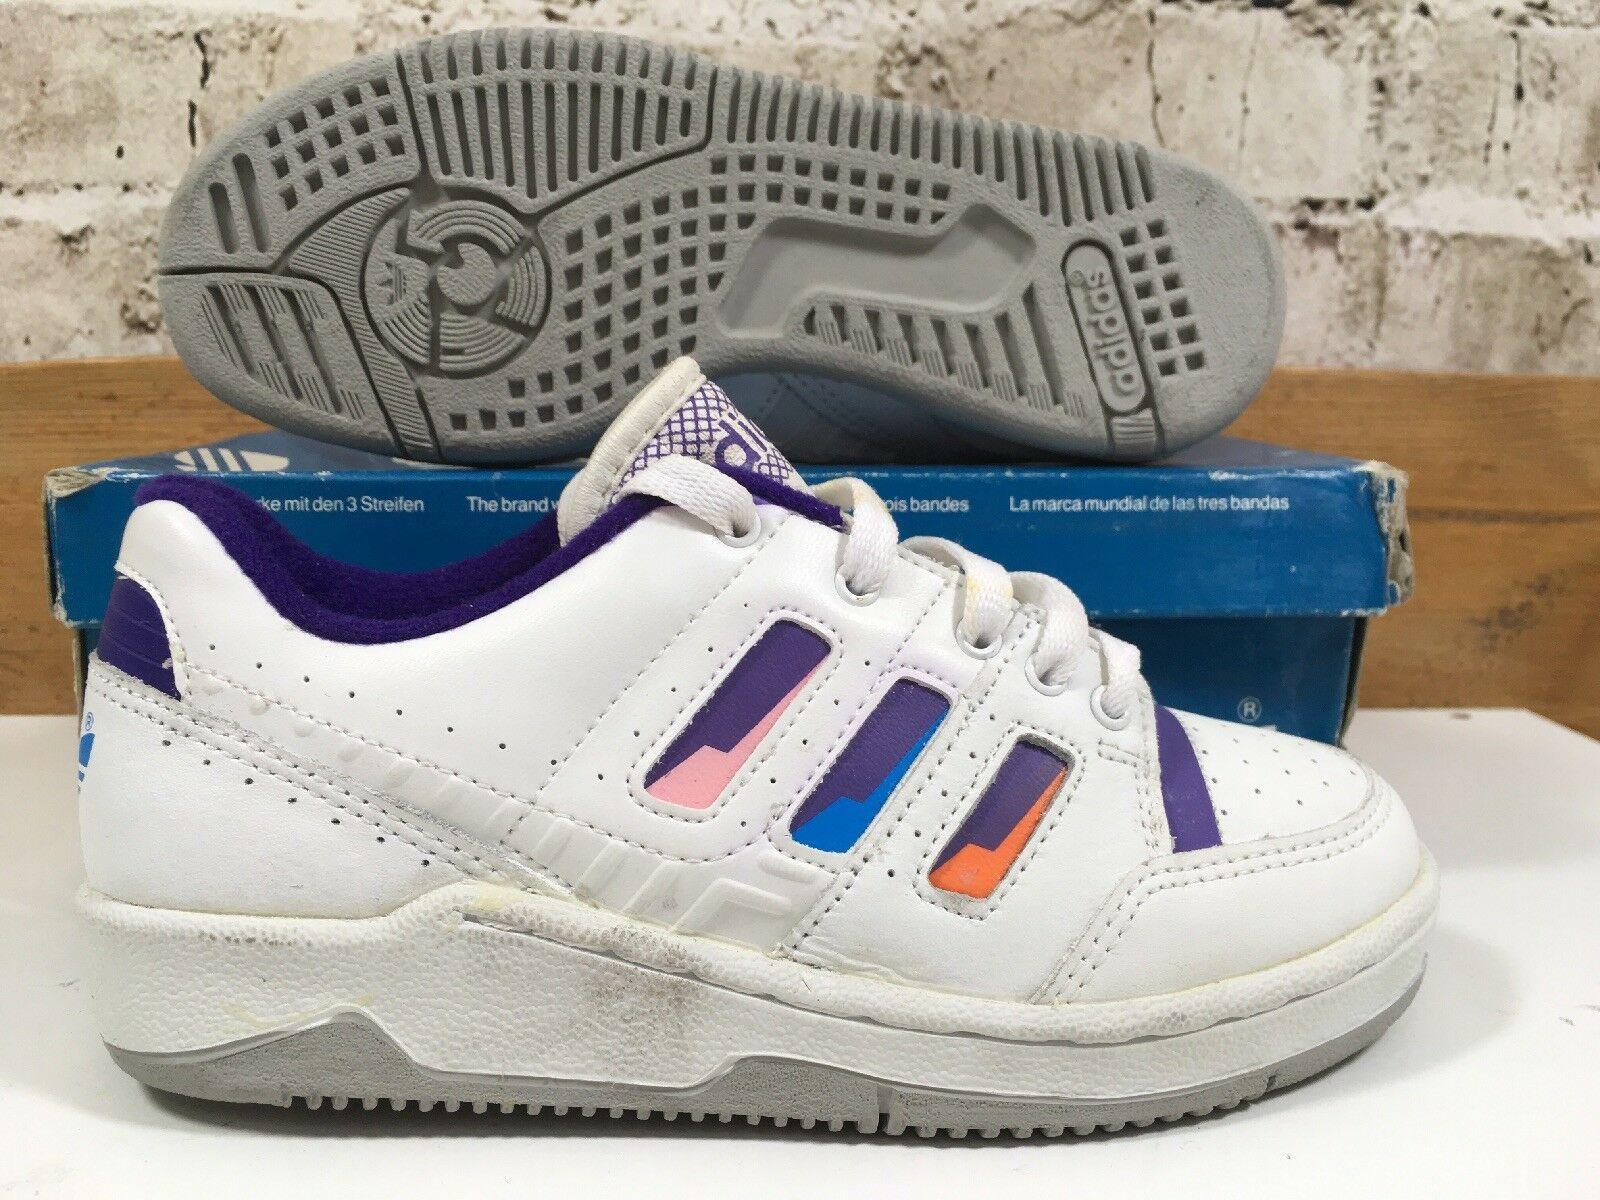 Vintage Eu Stefan Trainers Rare 34 Og Pro 1980 C Edberg 2 Uk Adidas eodCBx